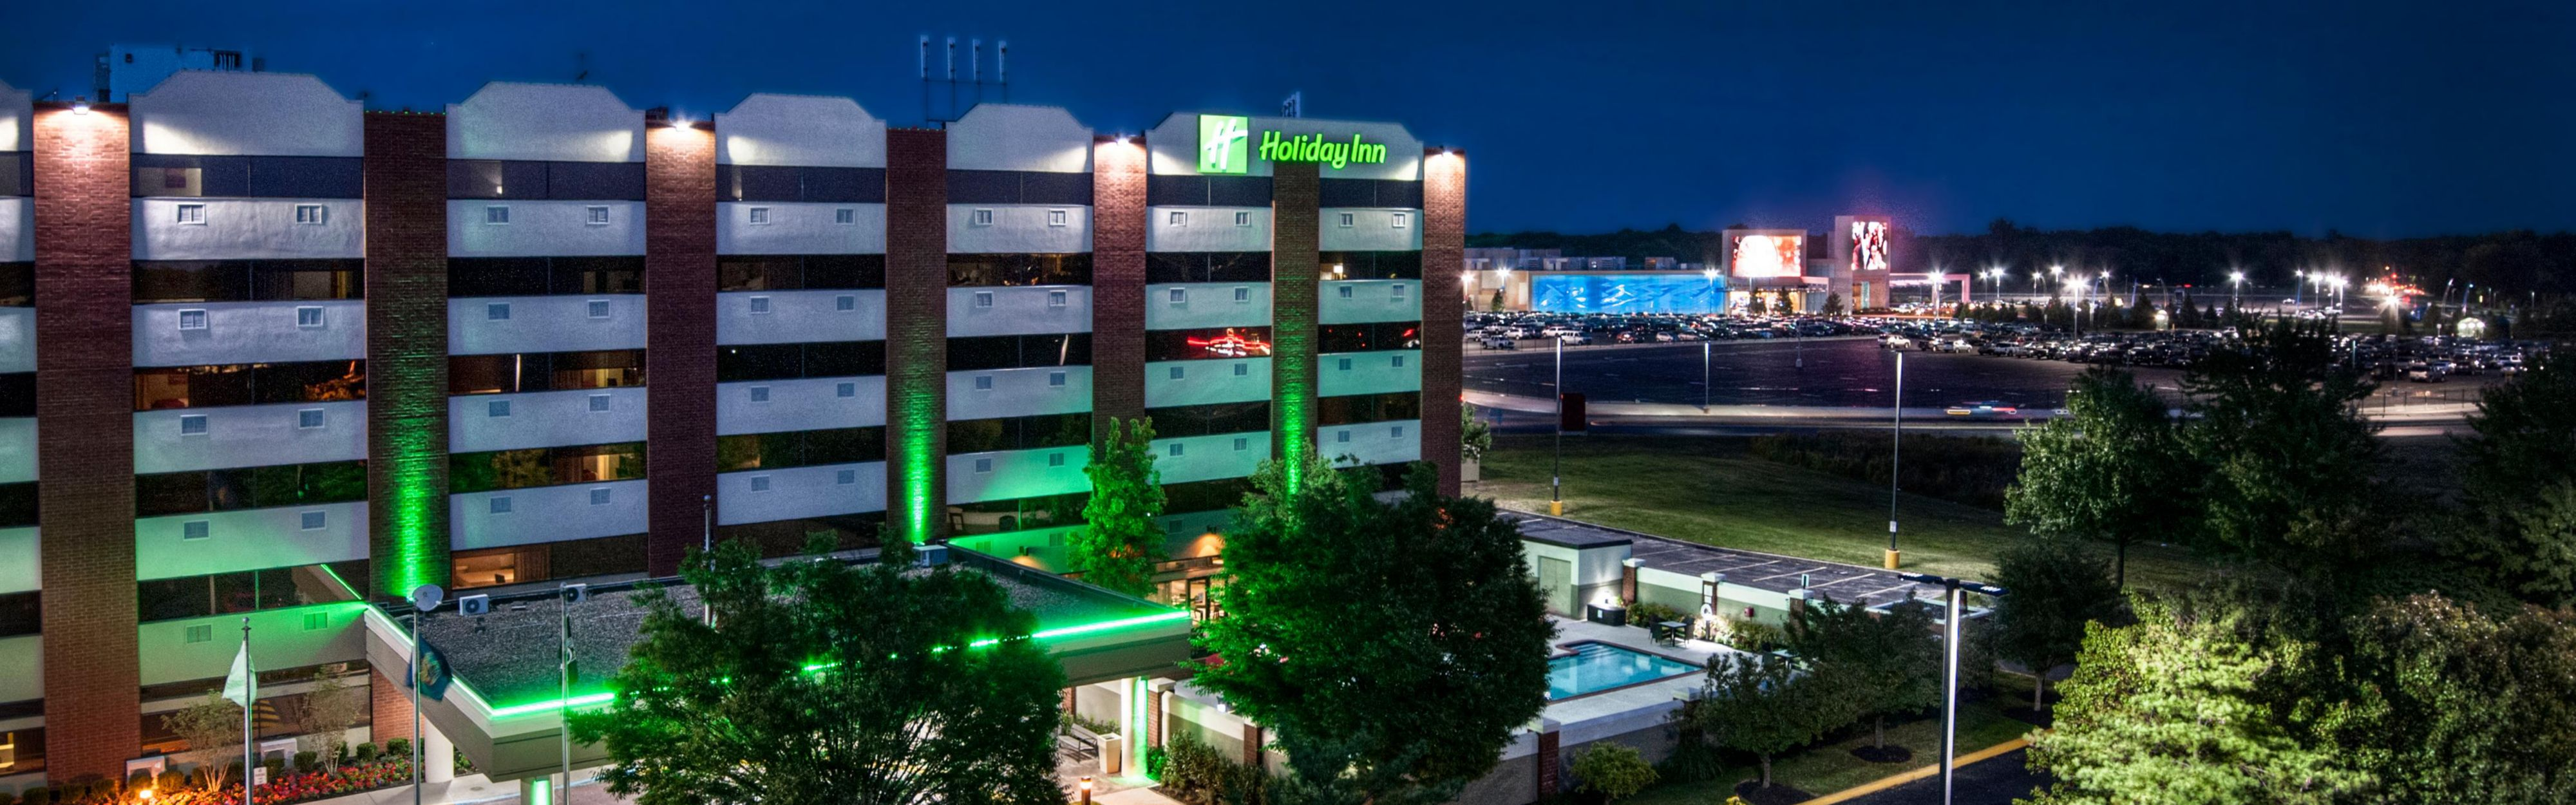 Holiday Inn Bensalem-Philadelphia Area image 0